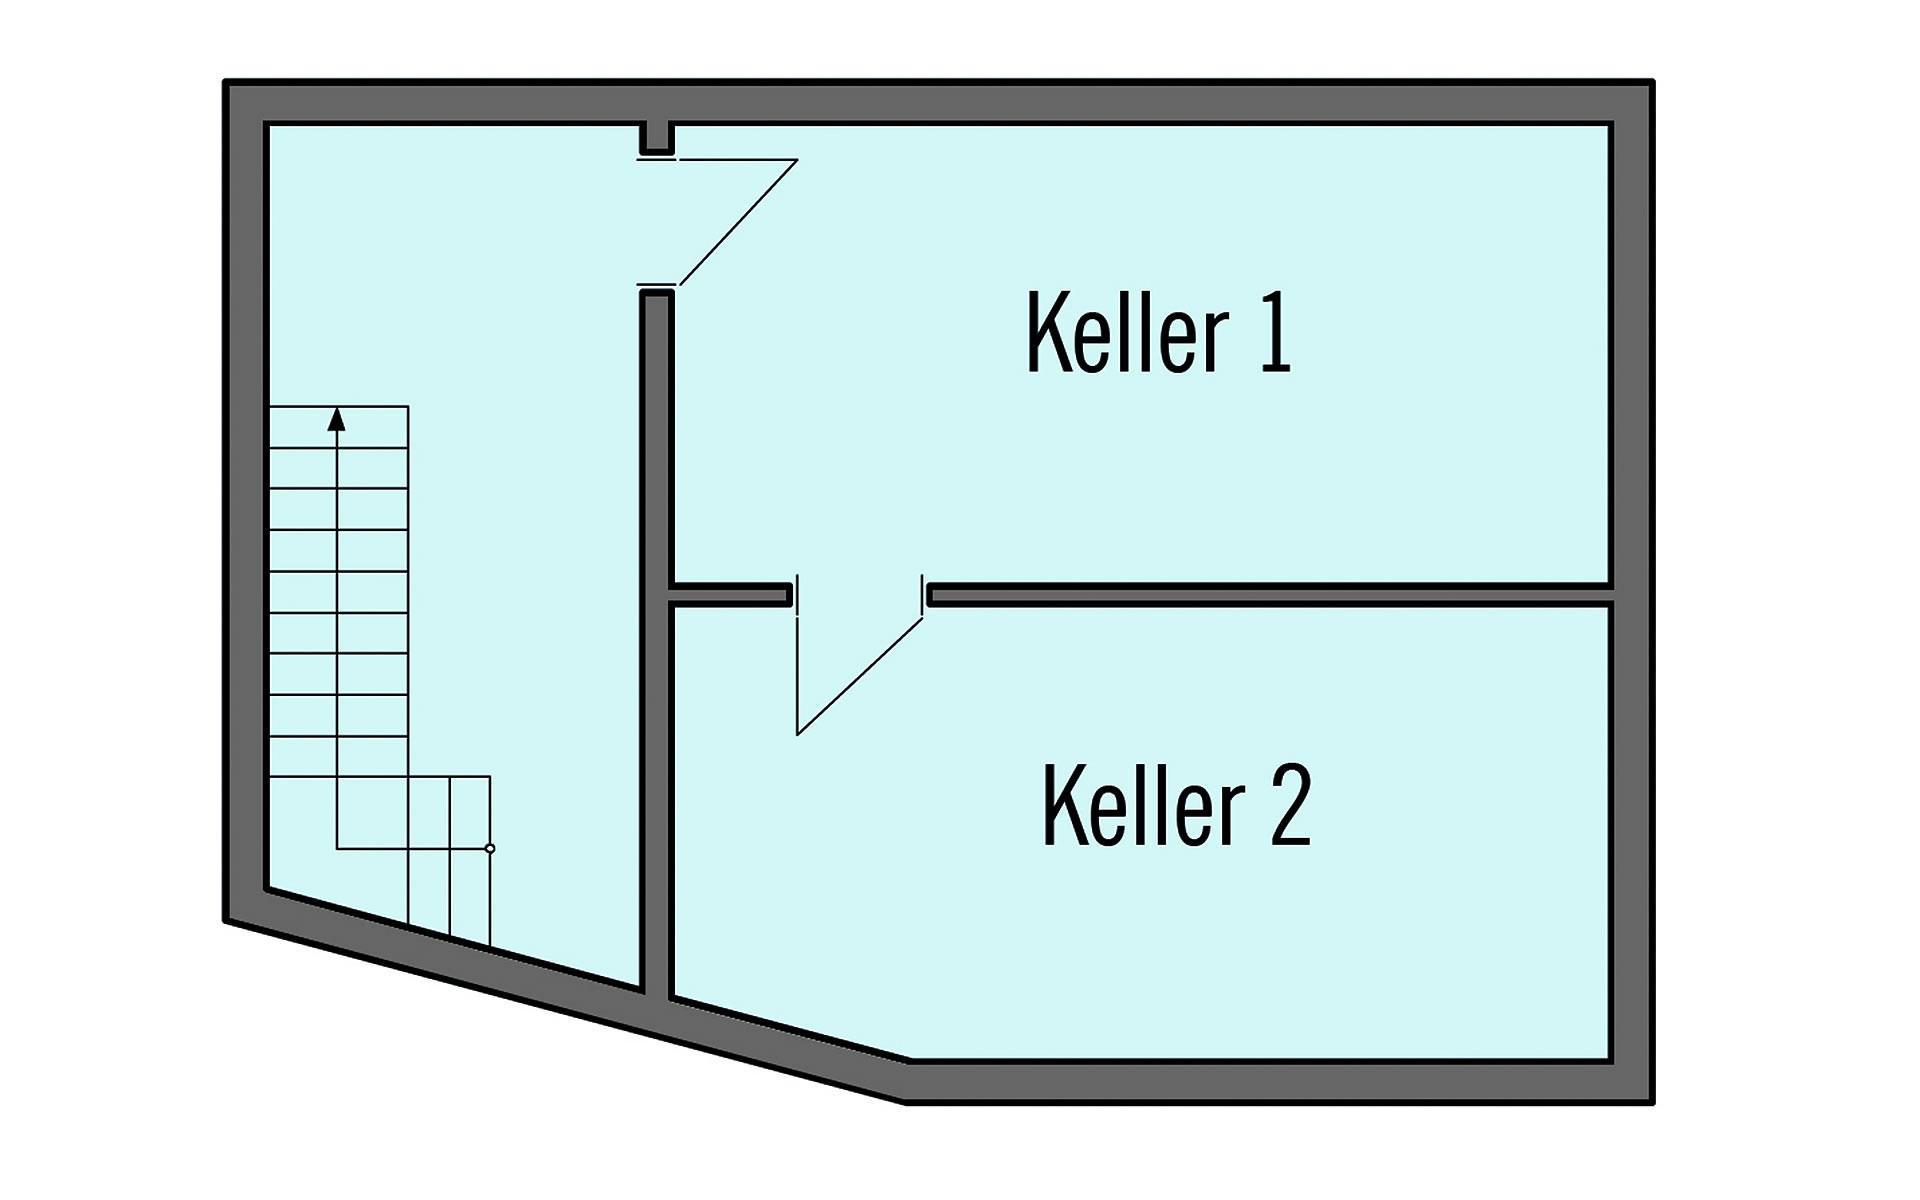 Keller Bullinger von Bau-Fritz GmbH & Co. KG, seit 1896